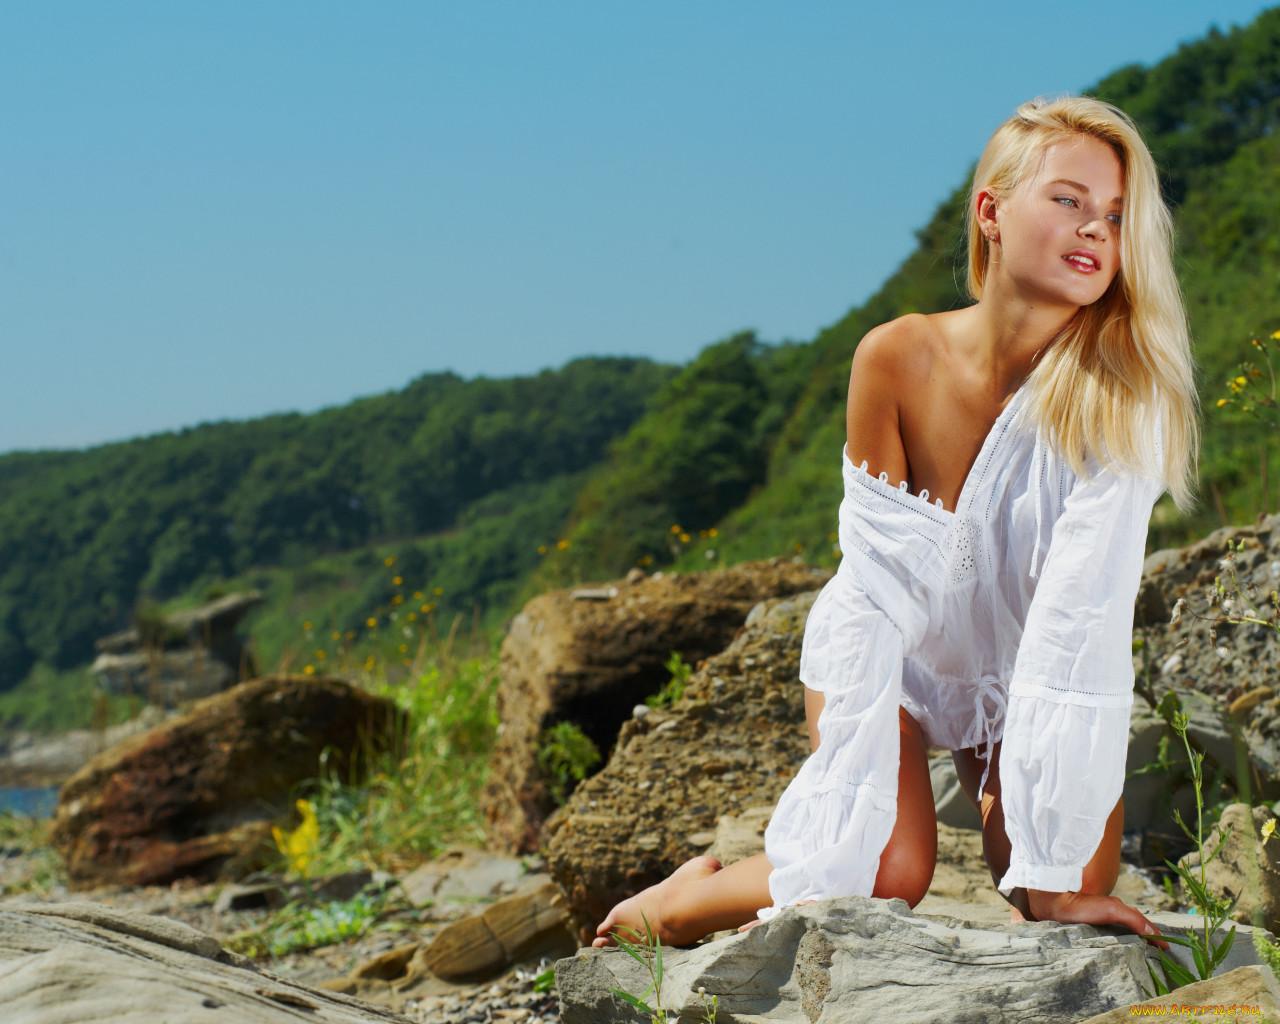 Блондинки на природе секс видео ценный